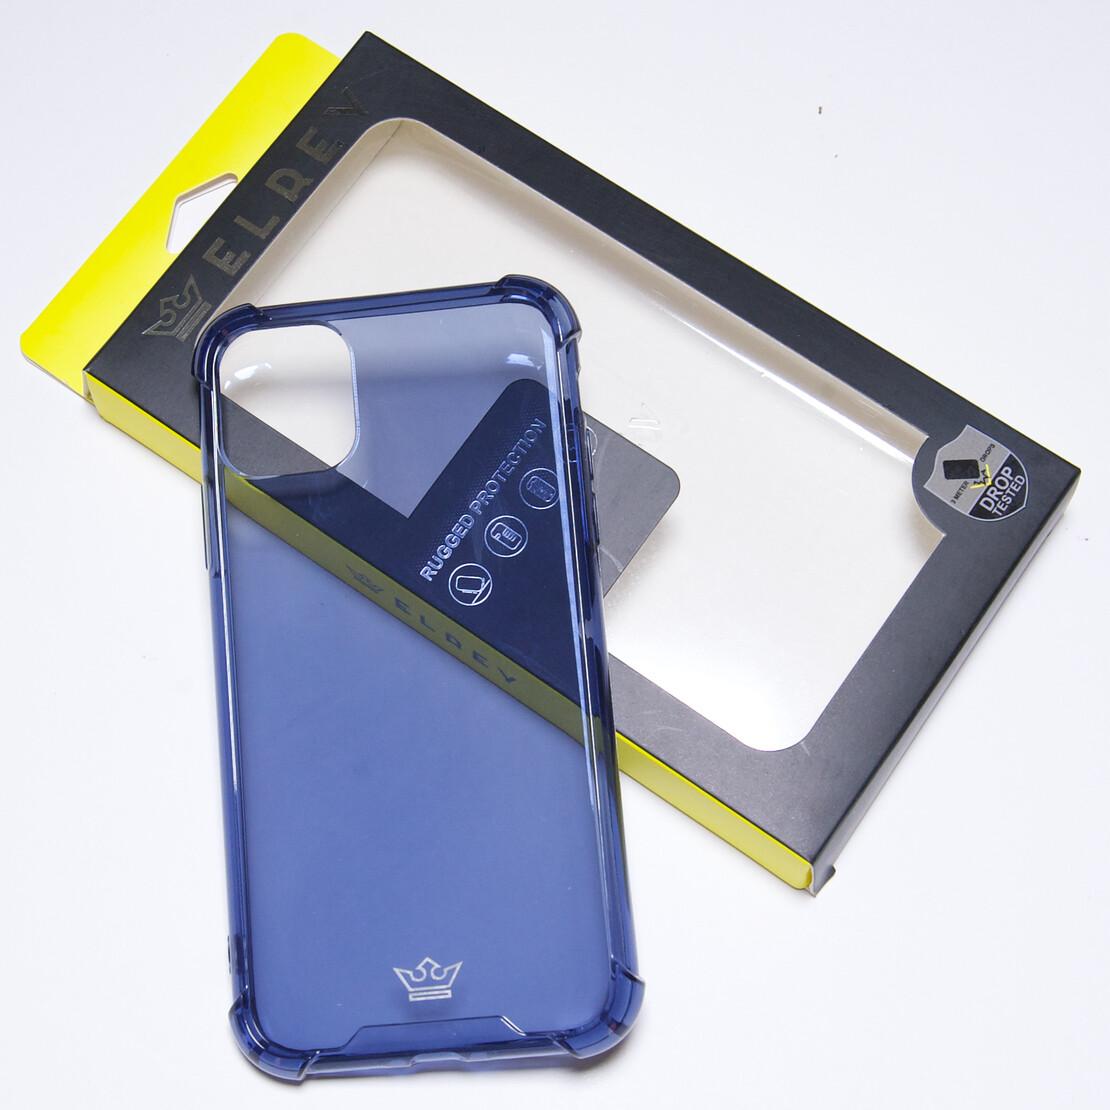 Estuche EL REY Hard Case Flexible Reforzado Azul Marino  Iphone 11 Pro